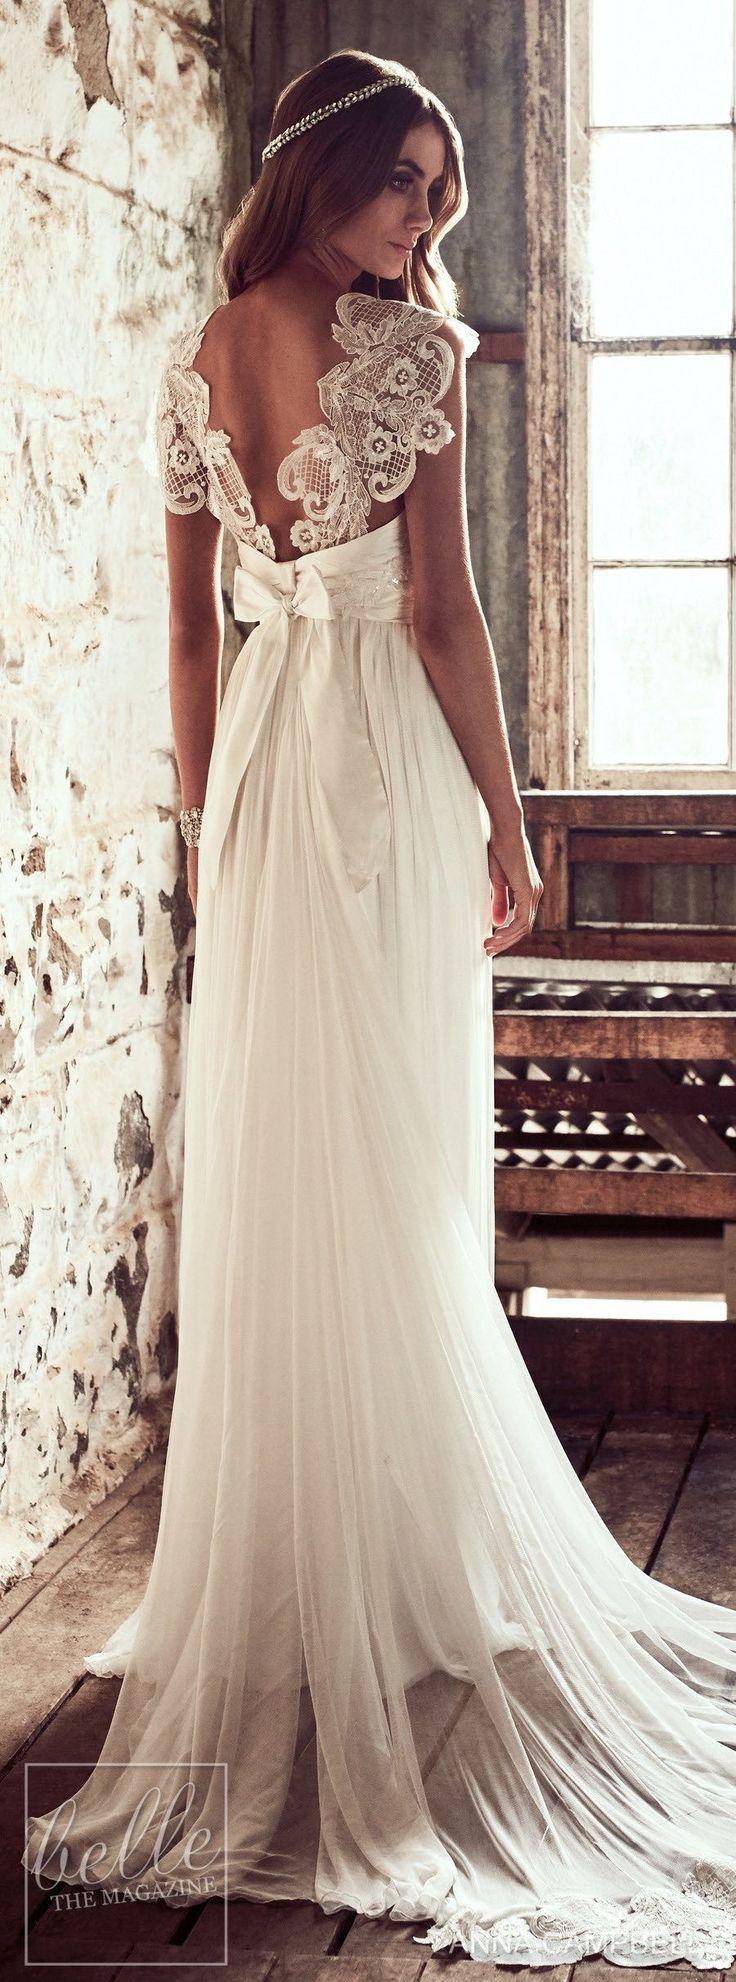 Wedding Dress by Anna Campbell 2018 Eternal Heart Collection